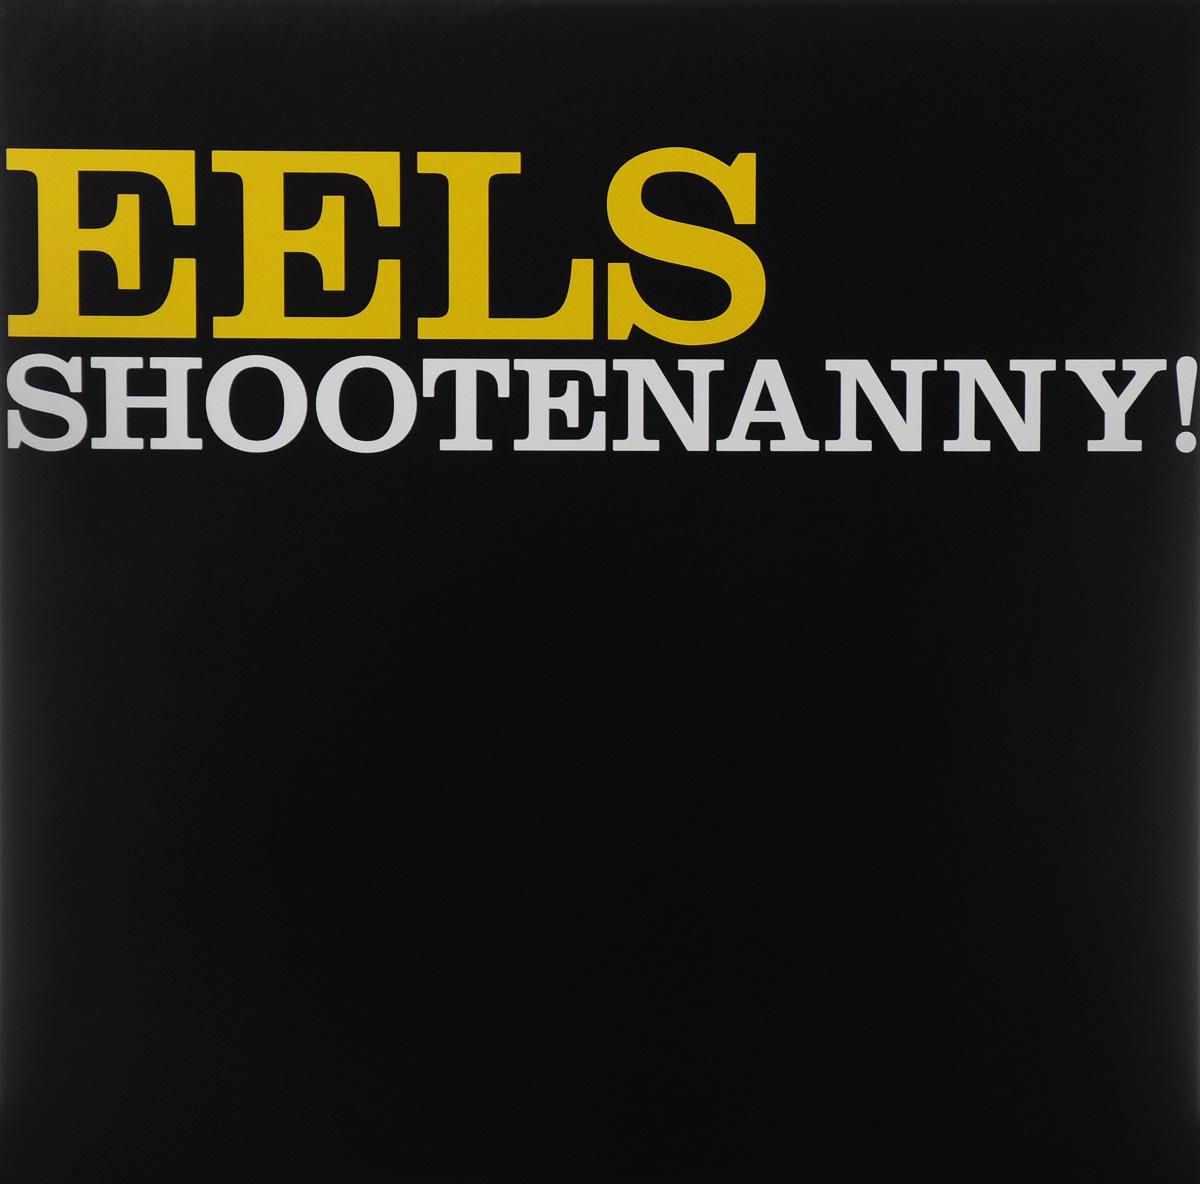 Eels Eels. Shootenanny! (LP) eels eels electro shock blues